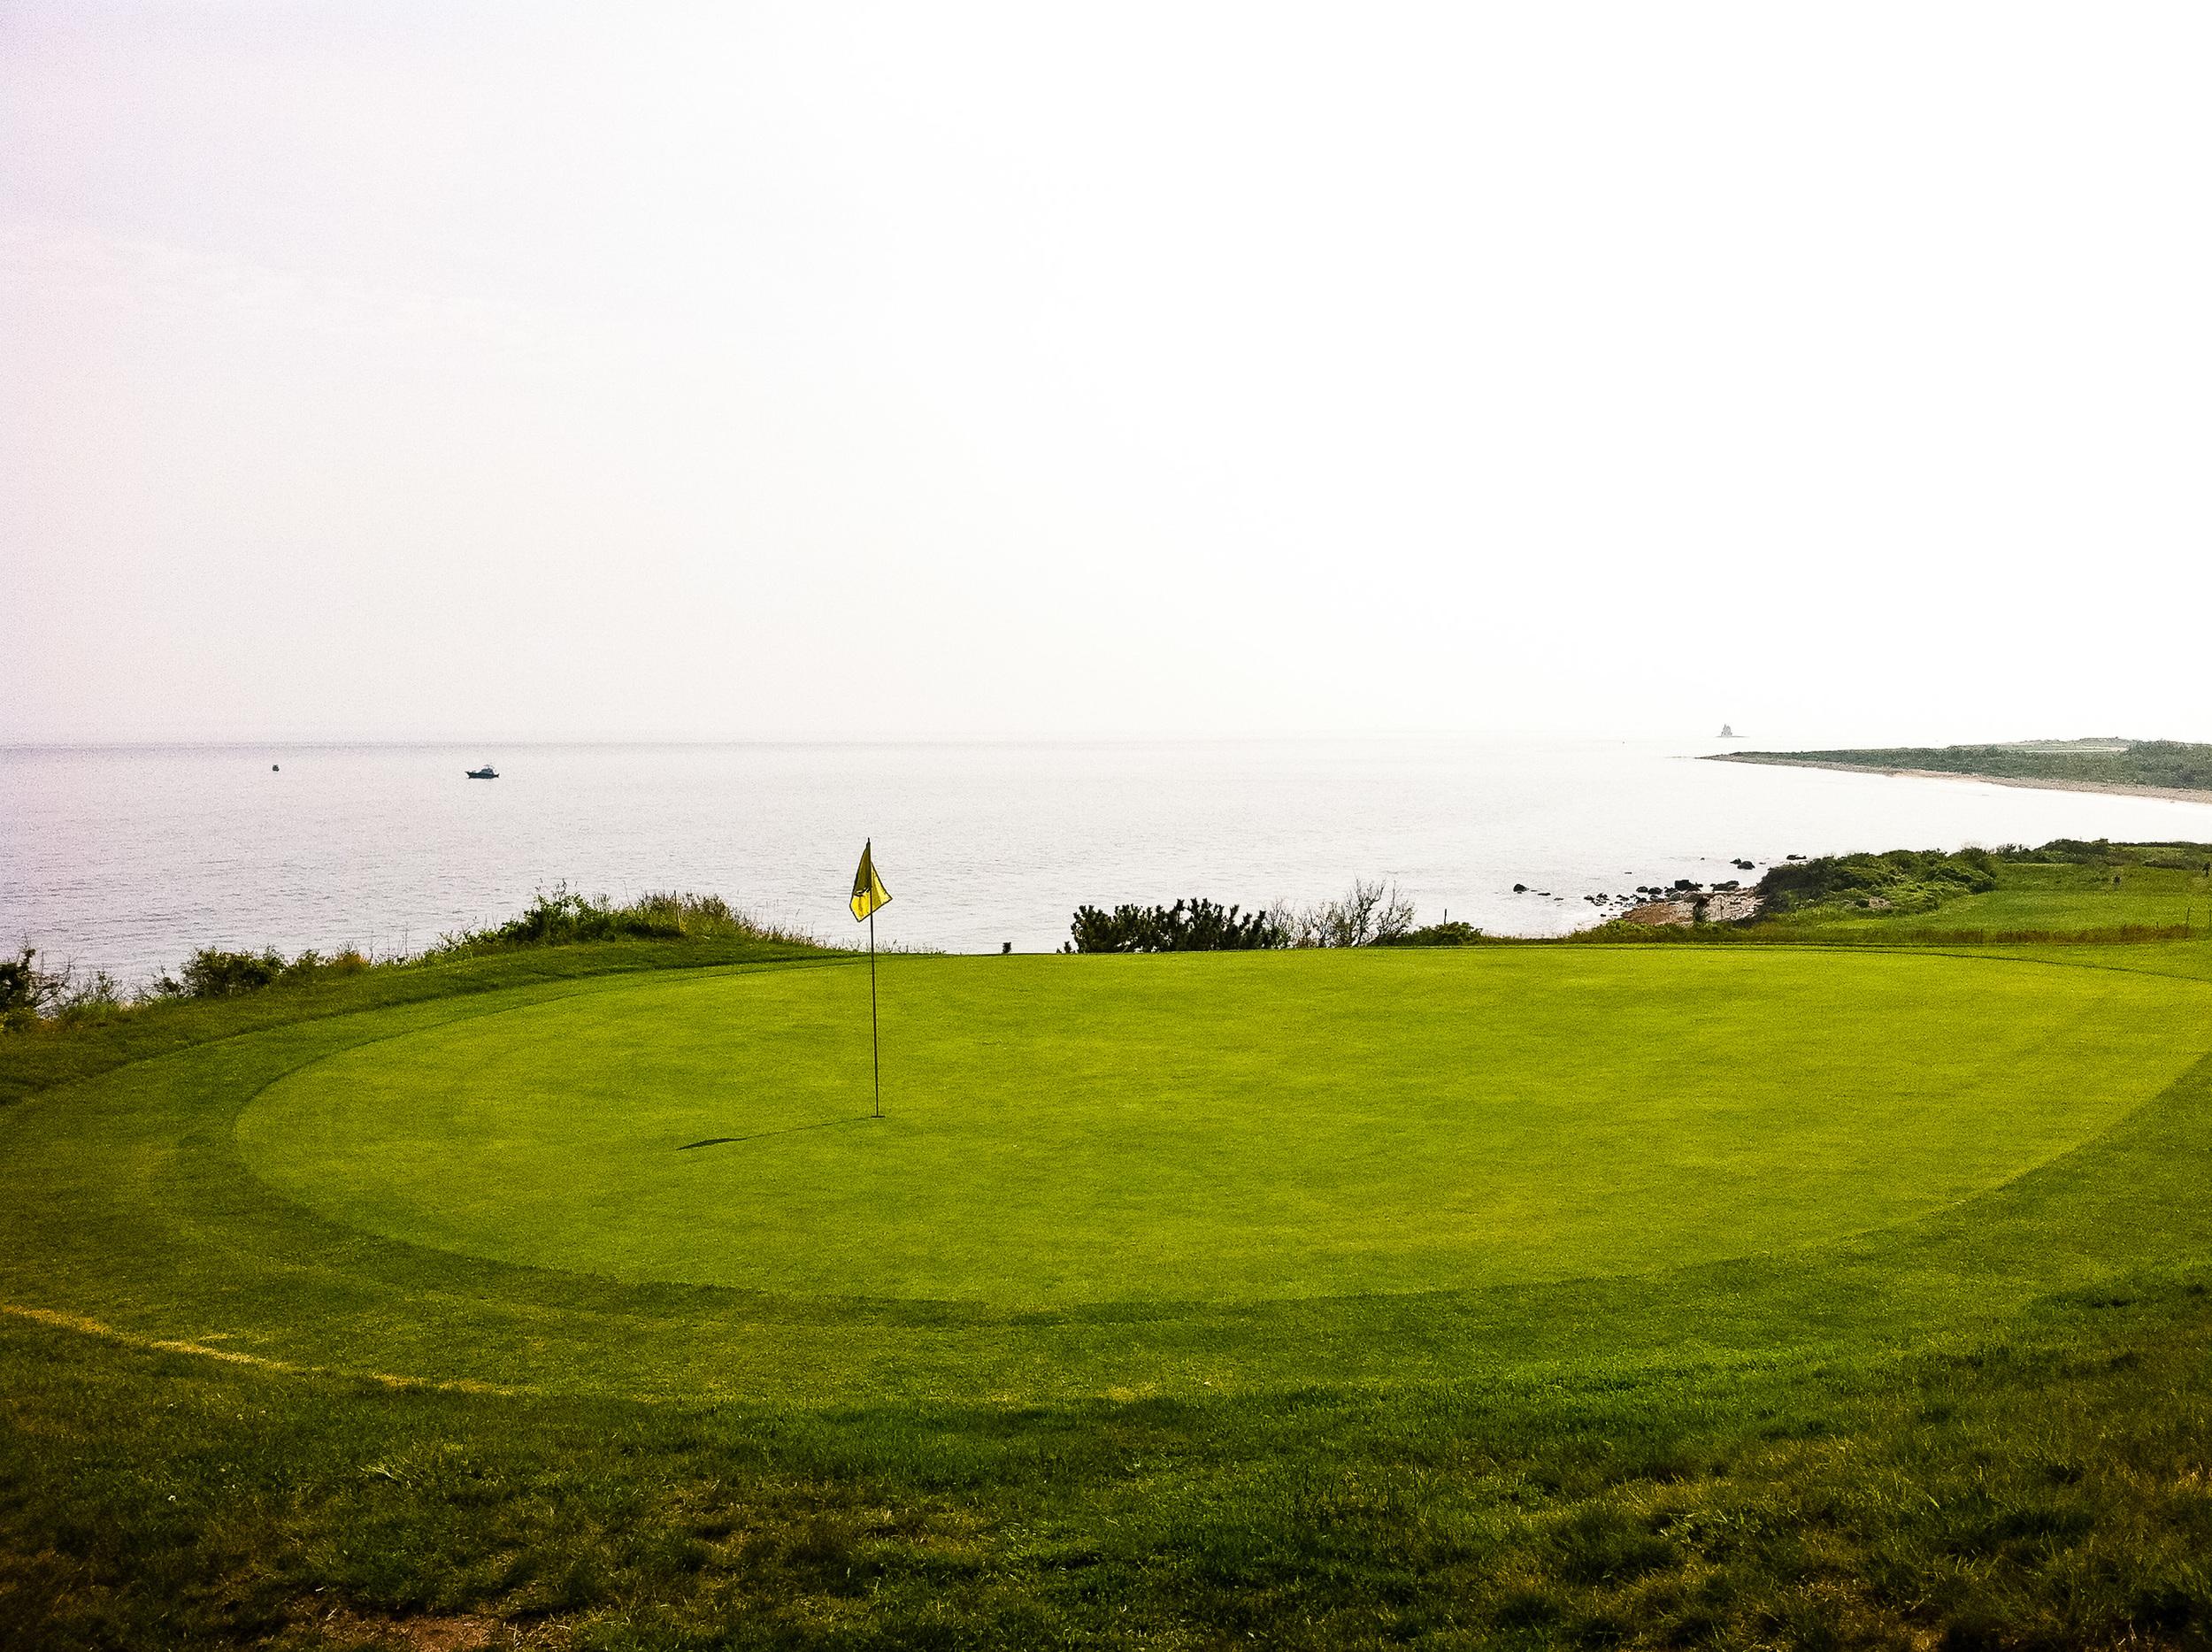 golf long island sound alue optics